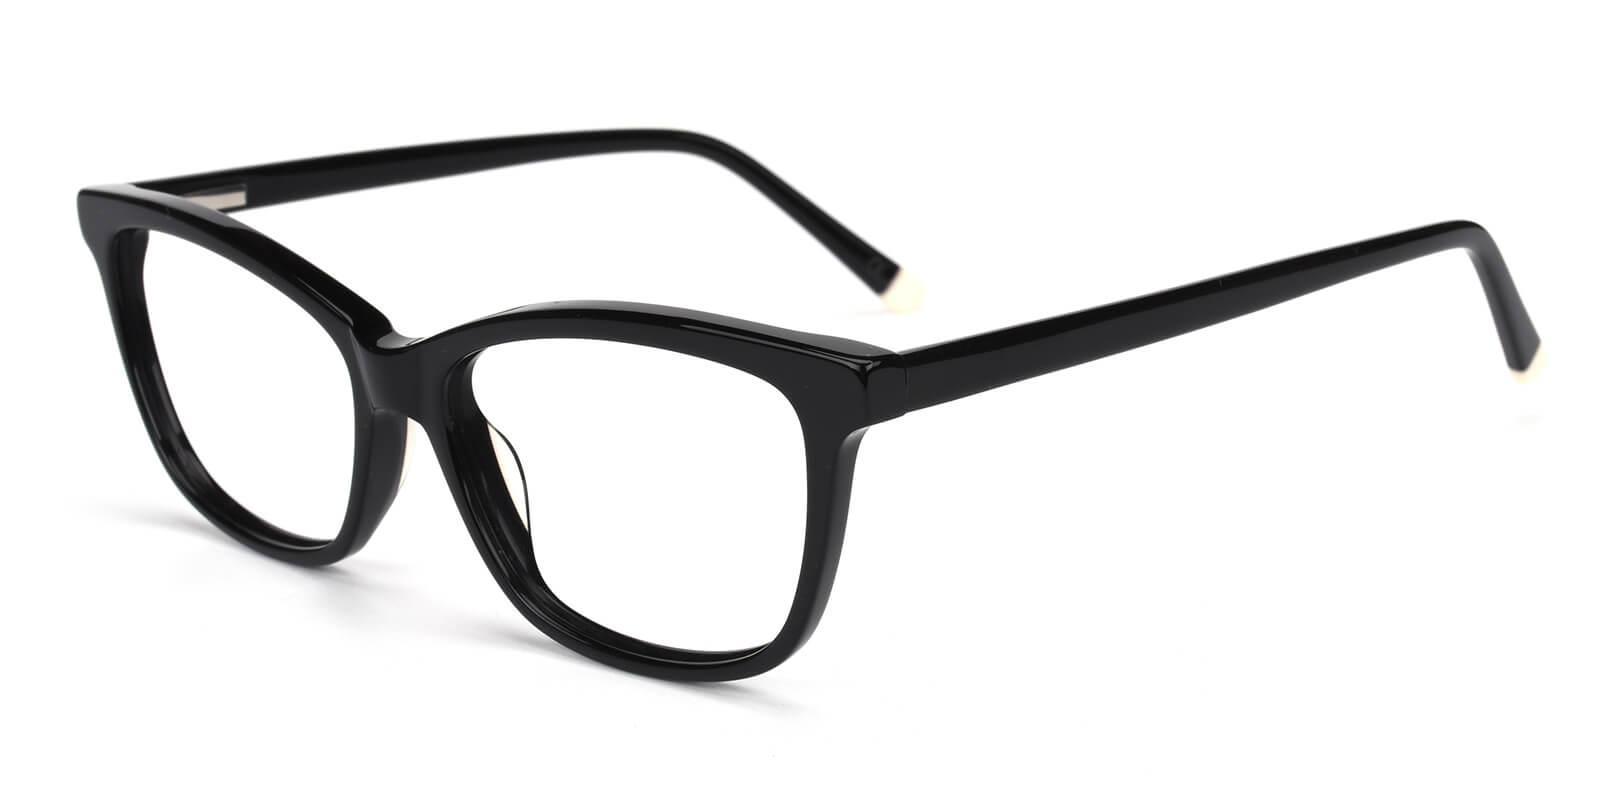 Ezra-Black-Cat-Acetate-Eyeglasses-detail